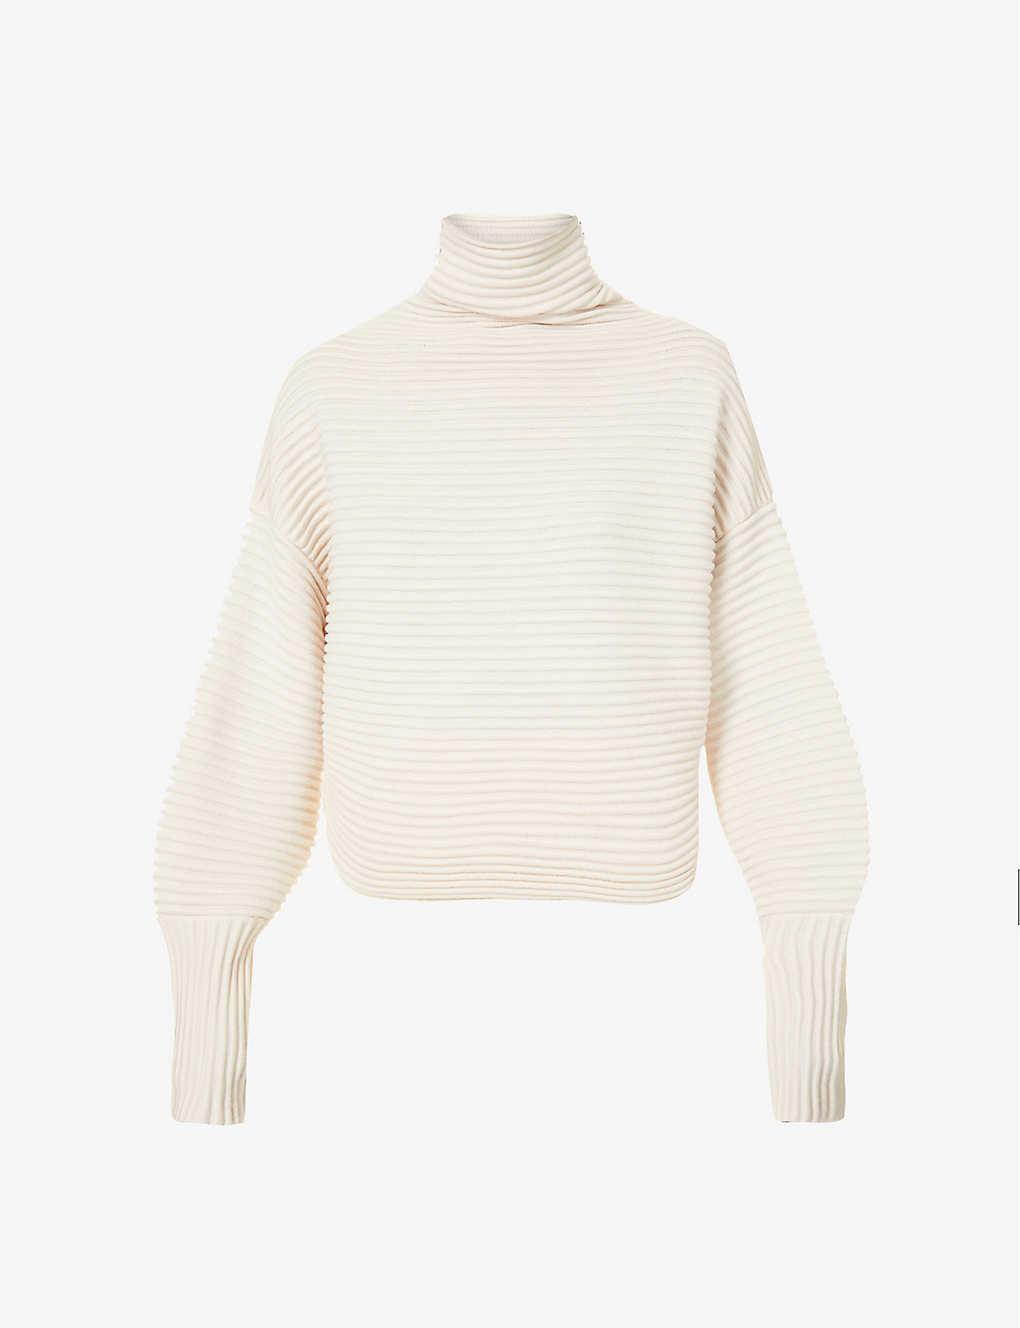 VB Ribbed Turtleneck Sweater